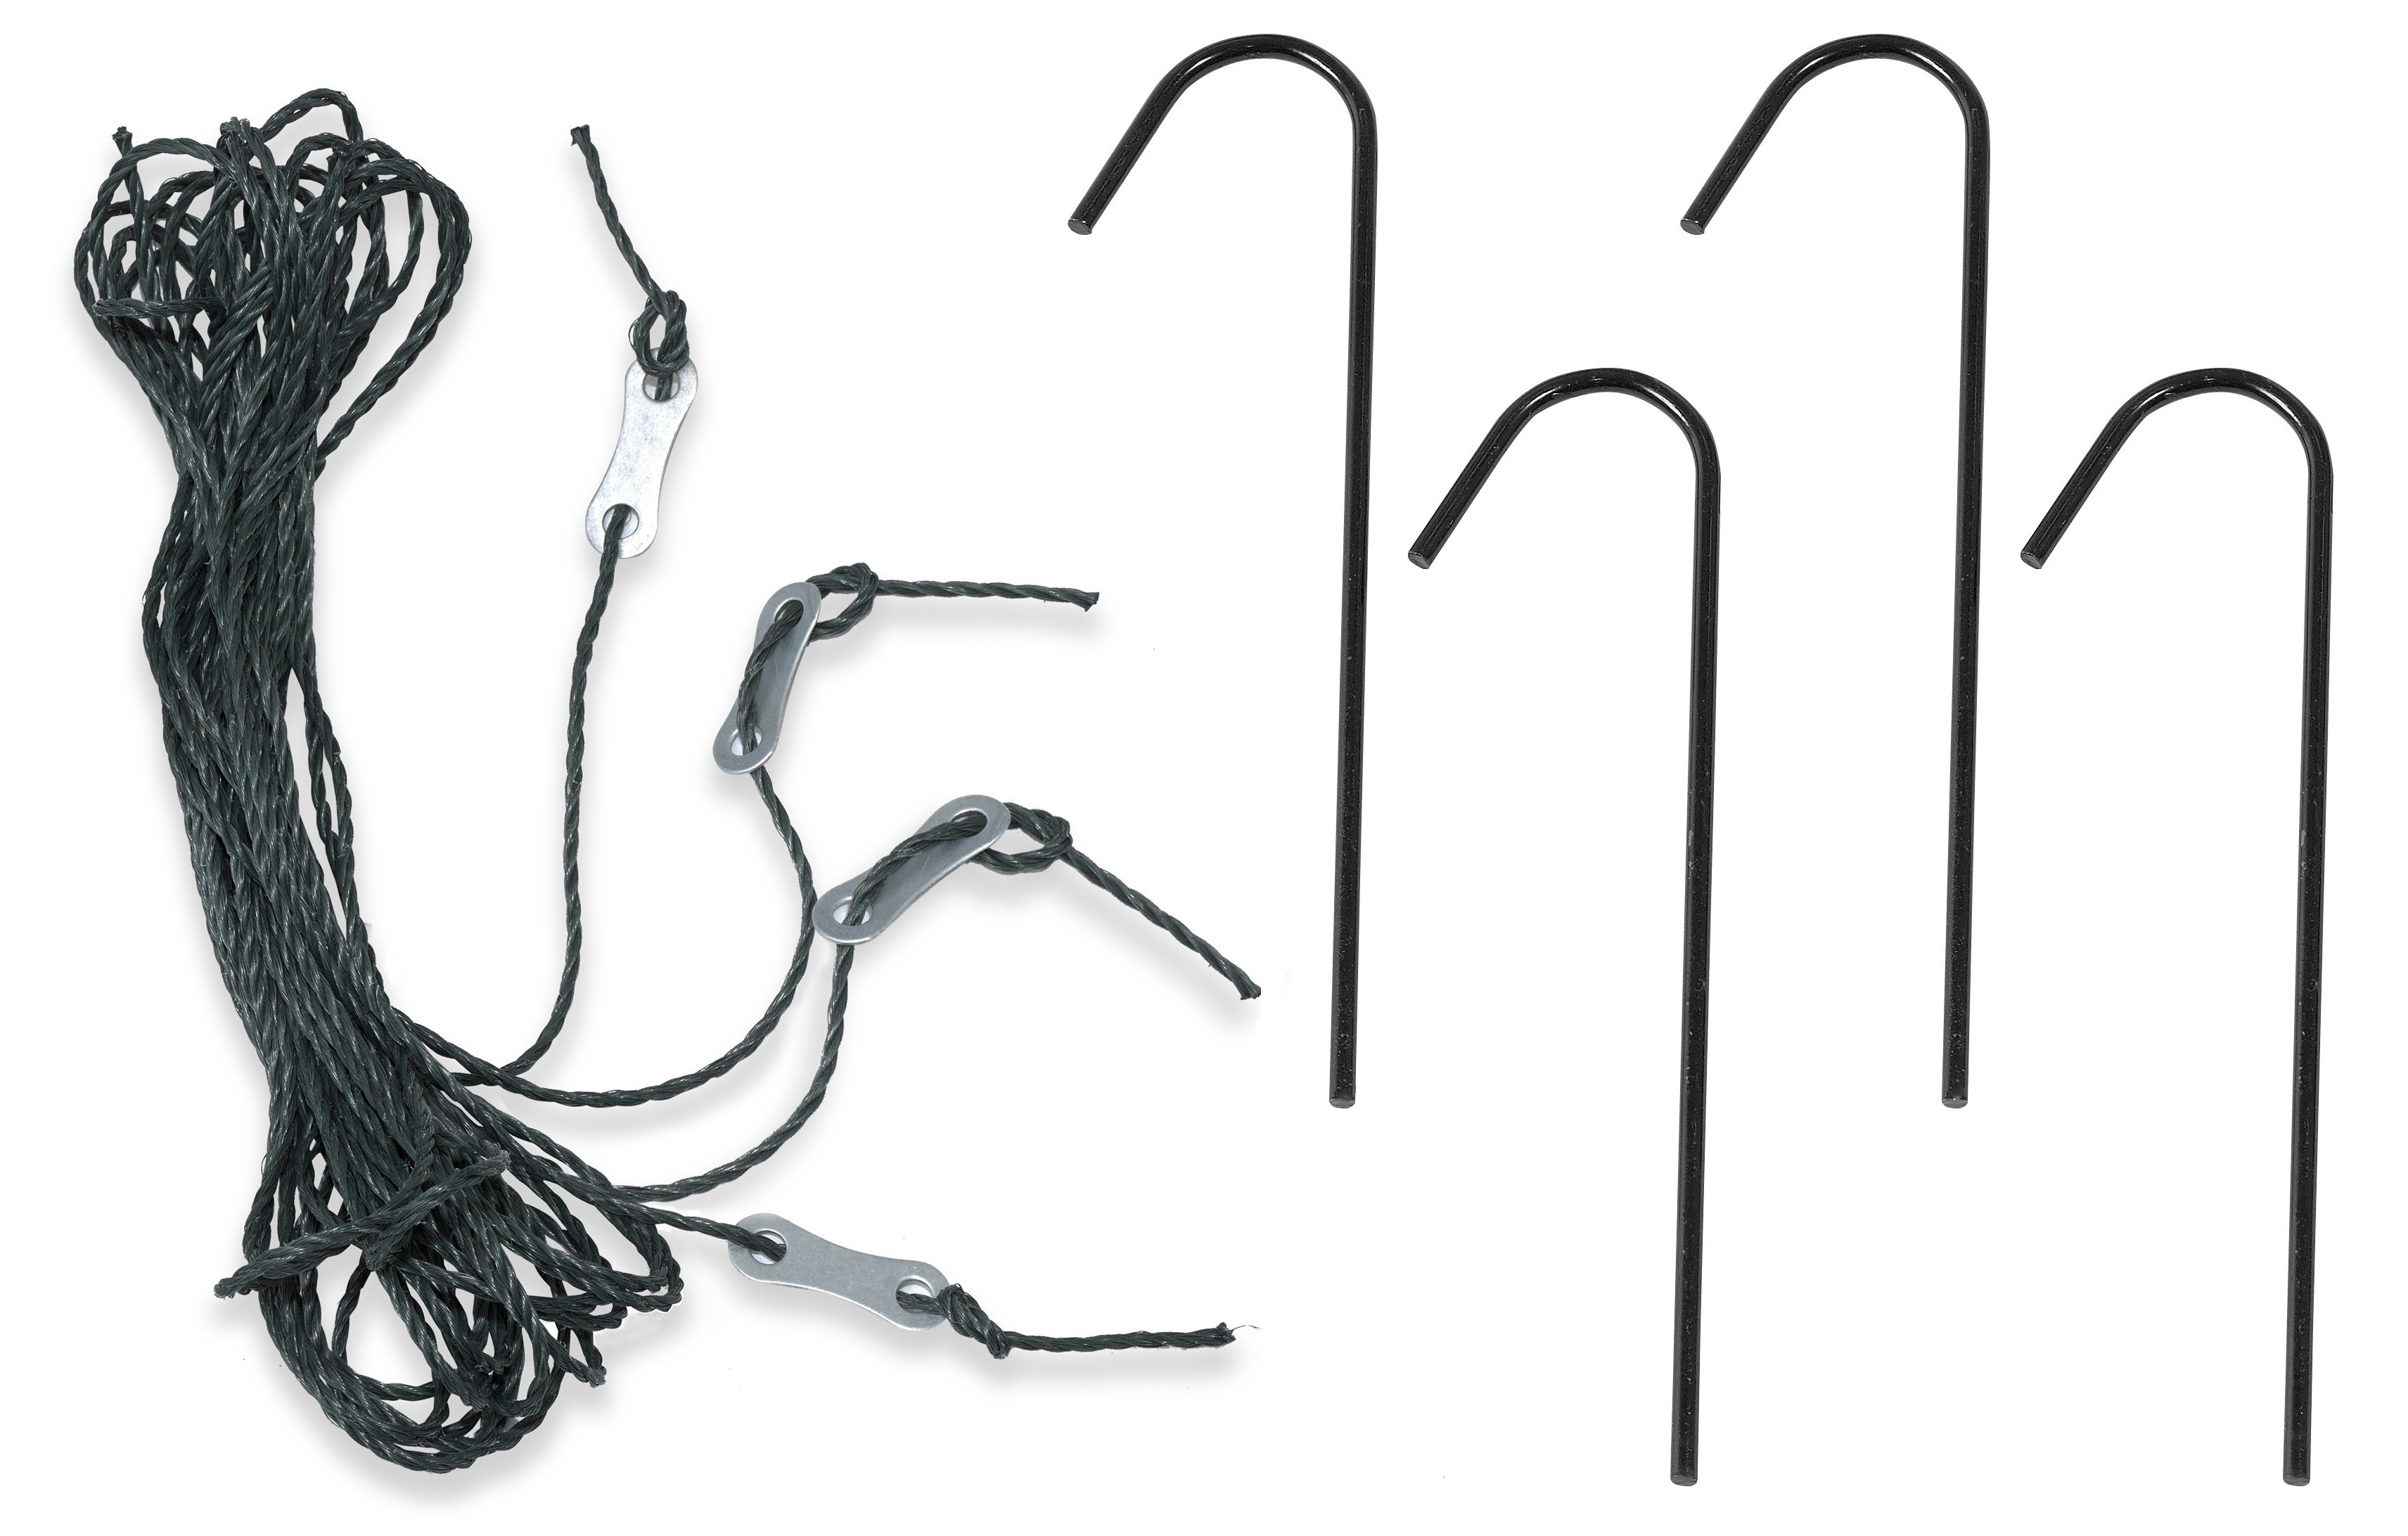 Deep Fastening Iron Garden Greenhouse Anchor Kit - Set of 4 Anchors & Guy Ropes